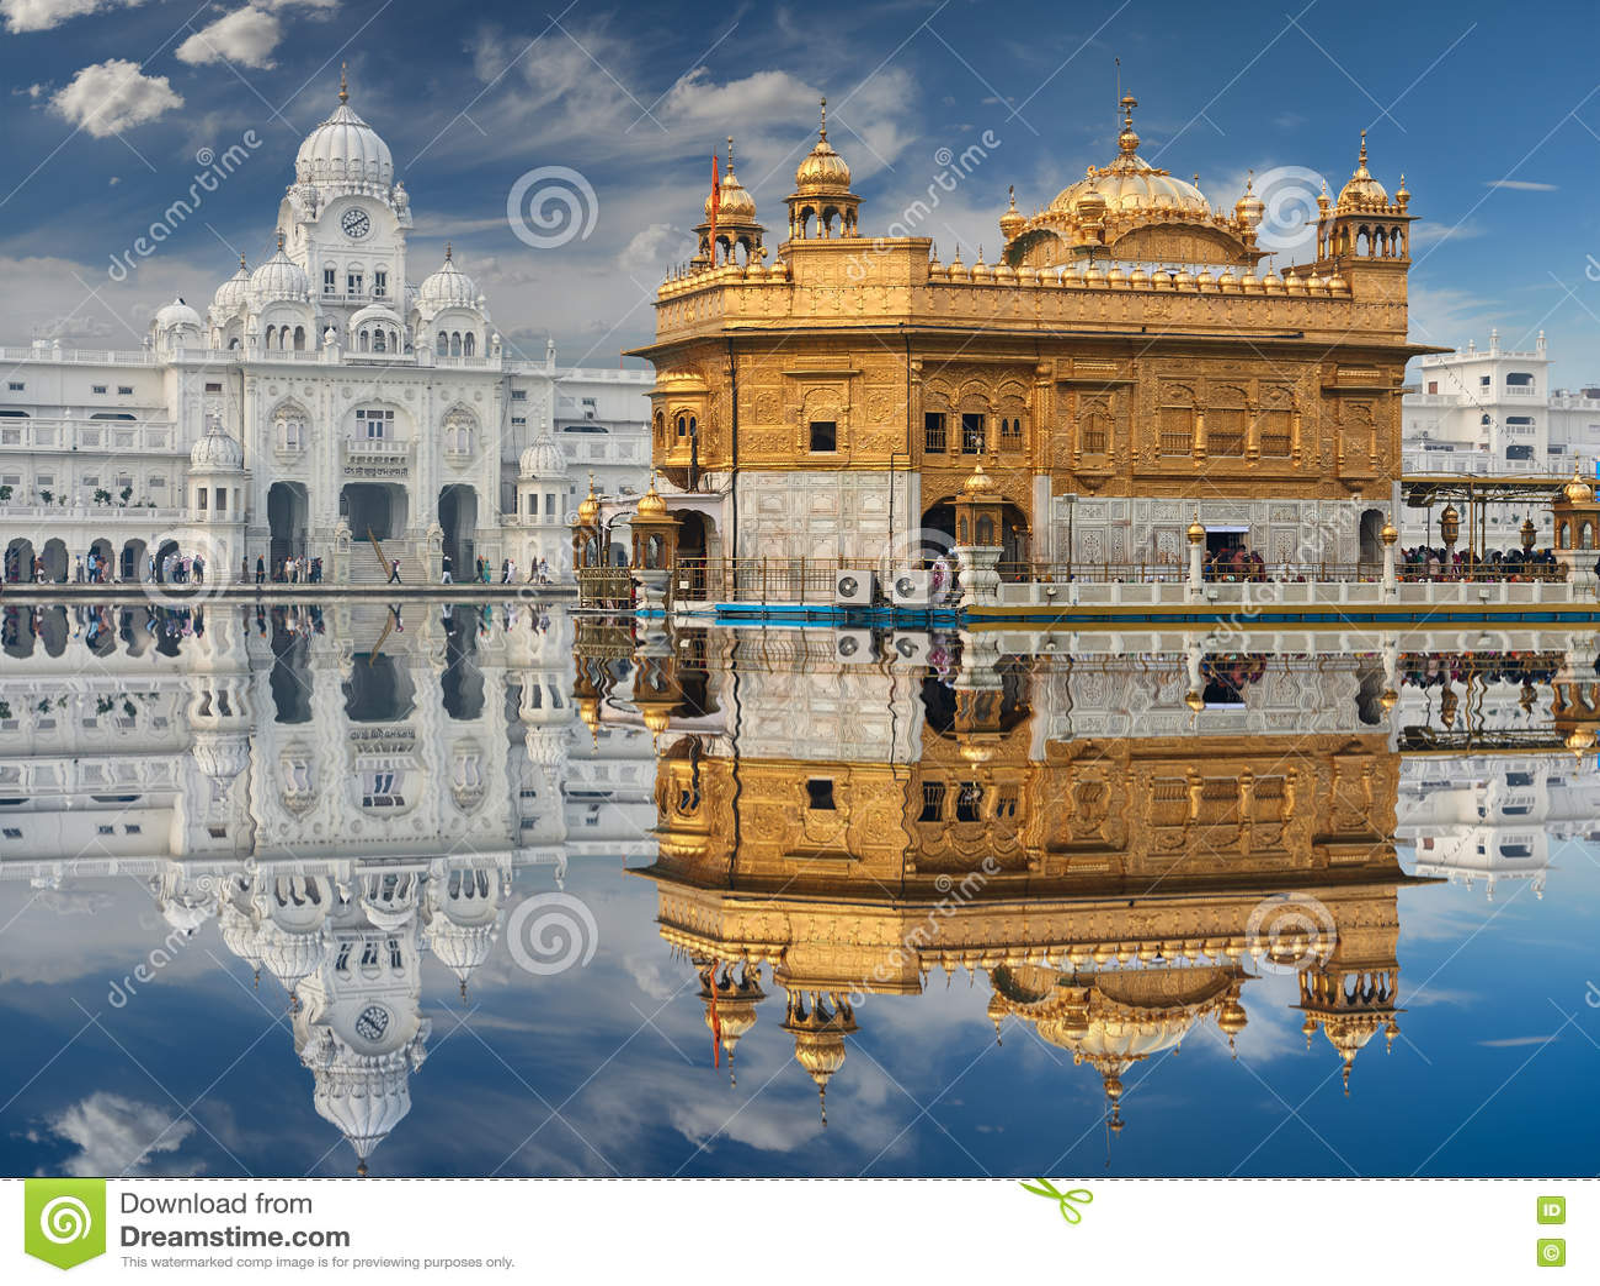 history of golden temple in punjabi pdf